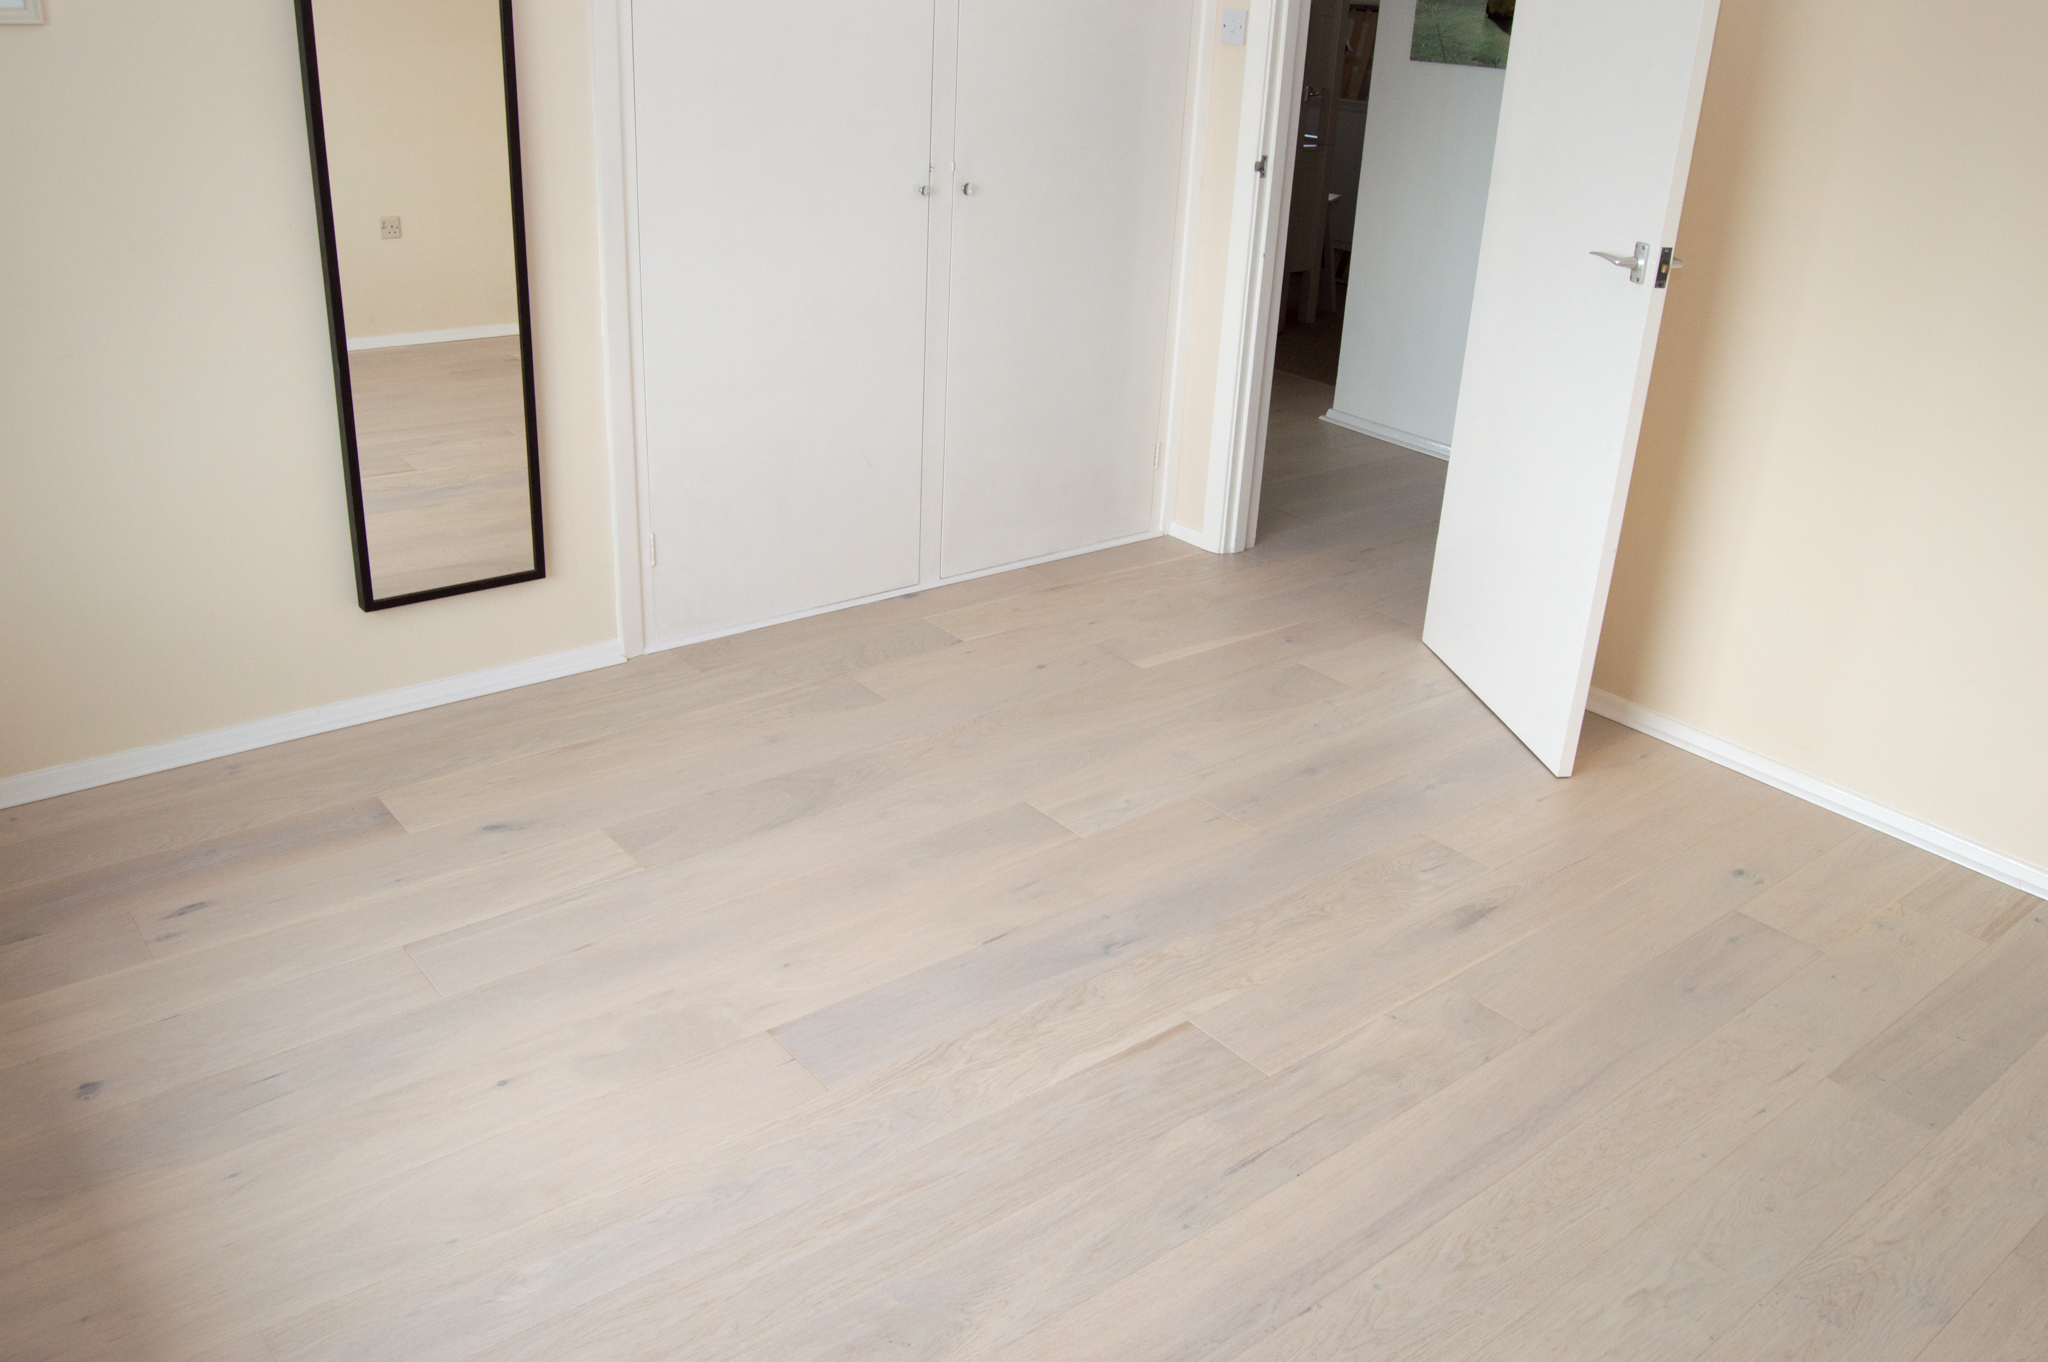 Oak engineered wood flooring floorwork hardwood carpets for Wood floor contractors